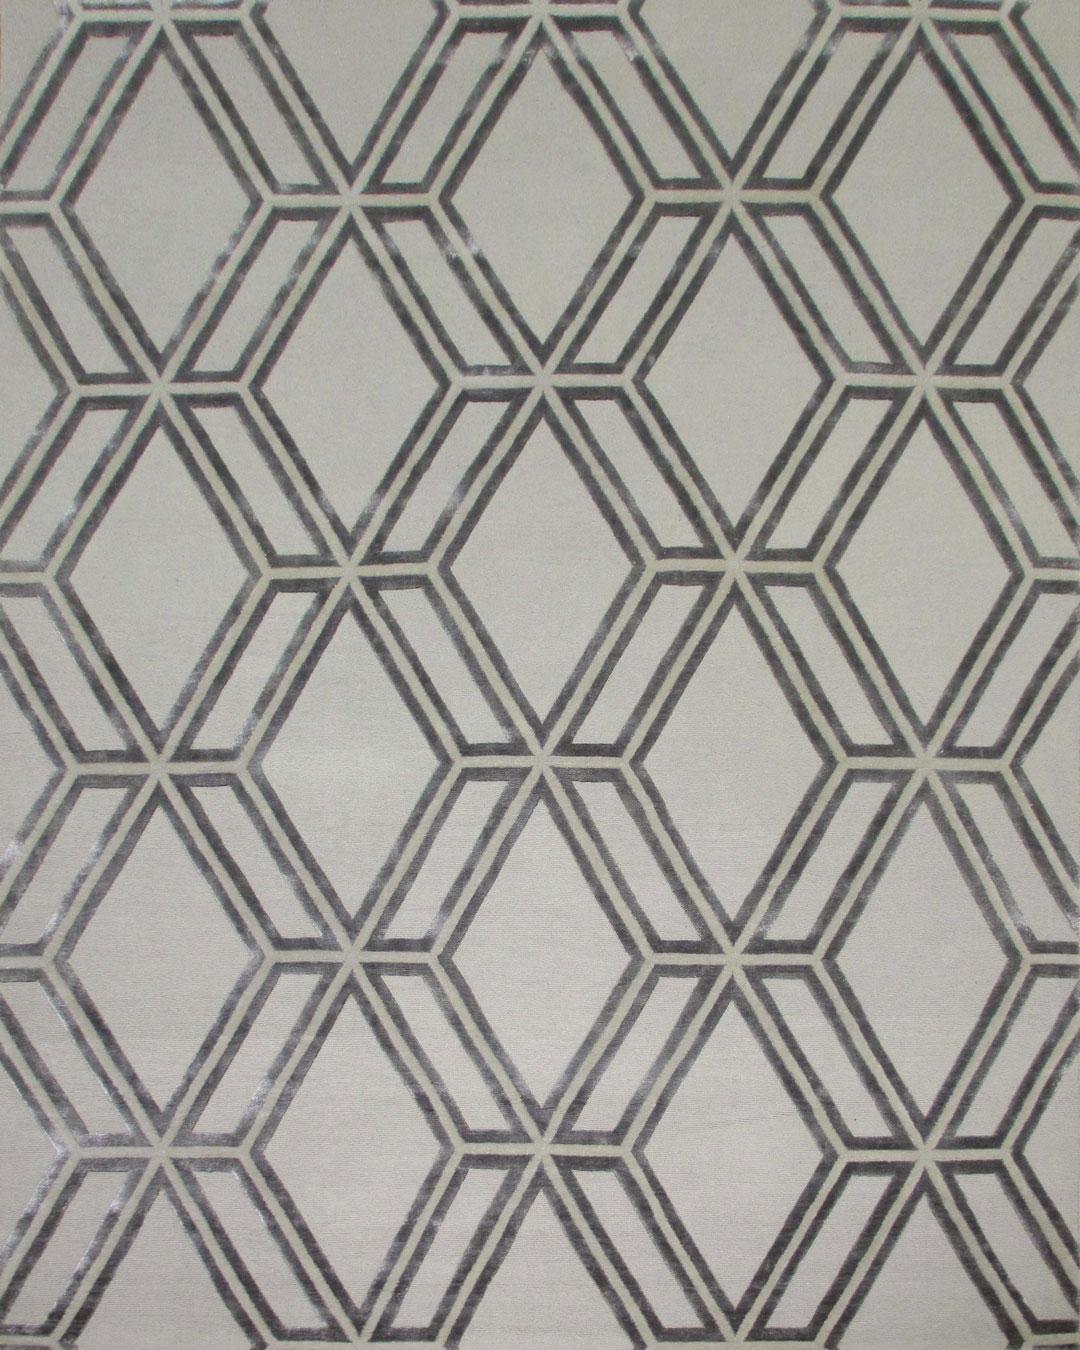 Overhead image of geometric Adesive rug in grey